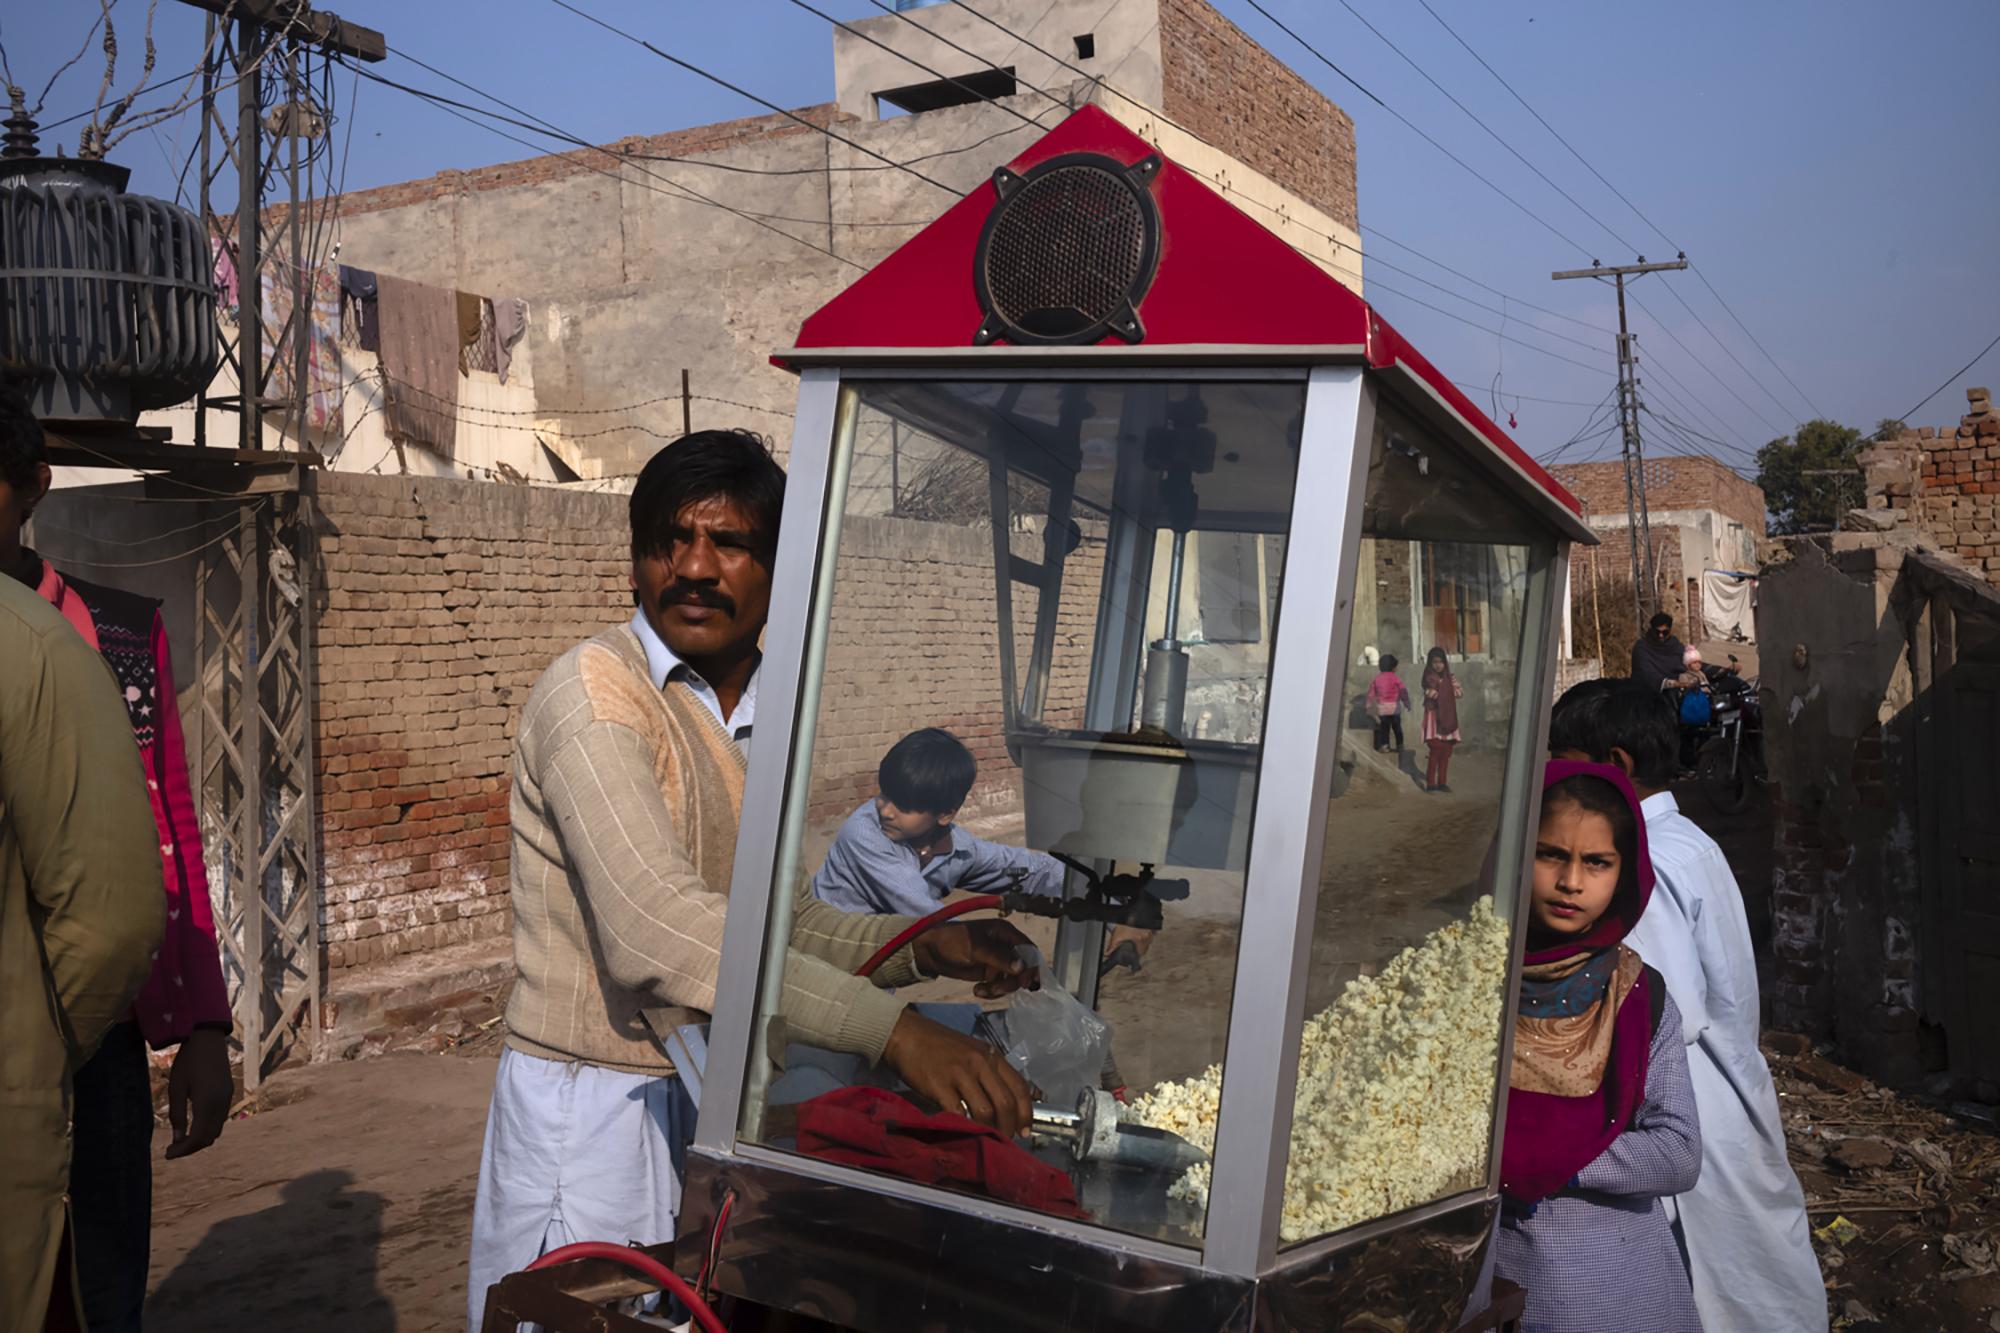 Graciela Magnoni Pakistan.jpg